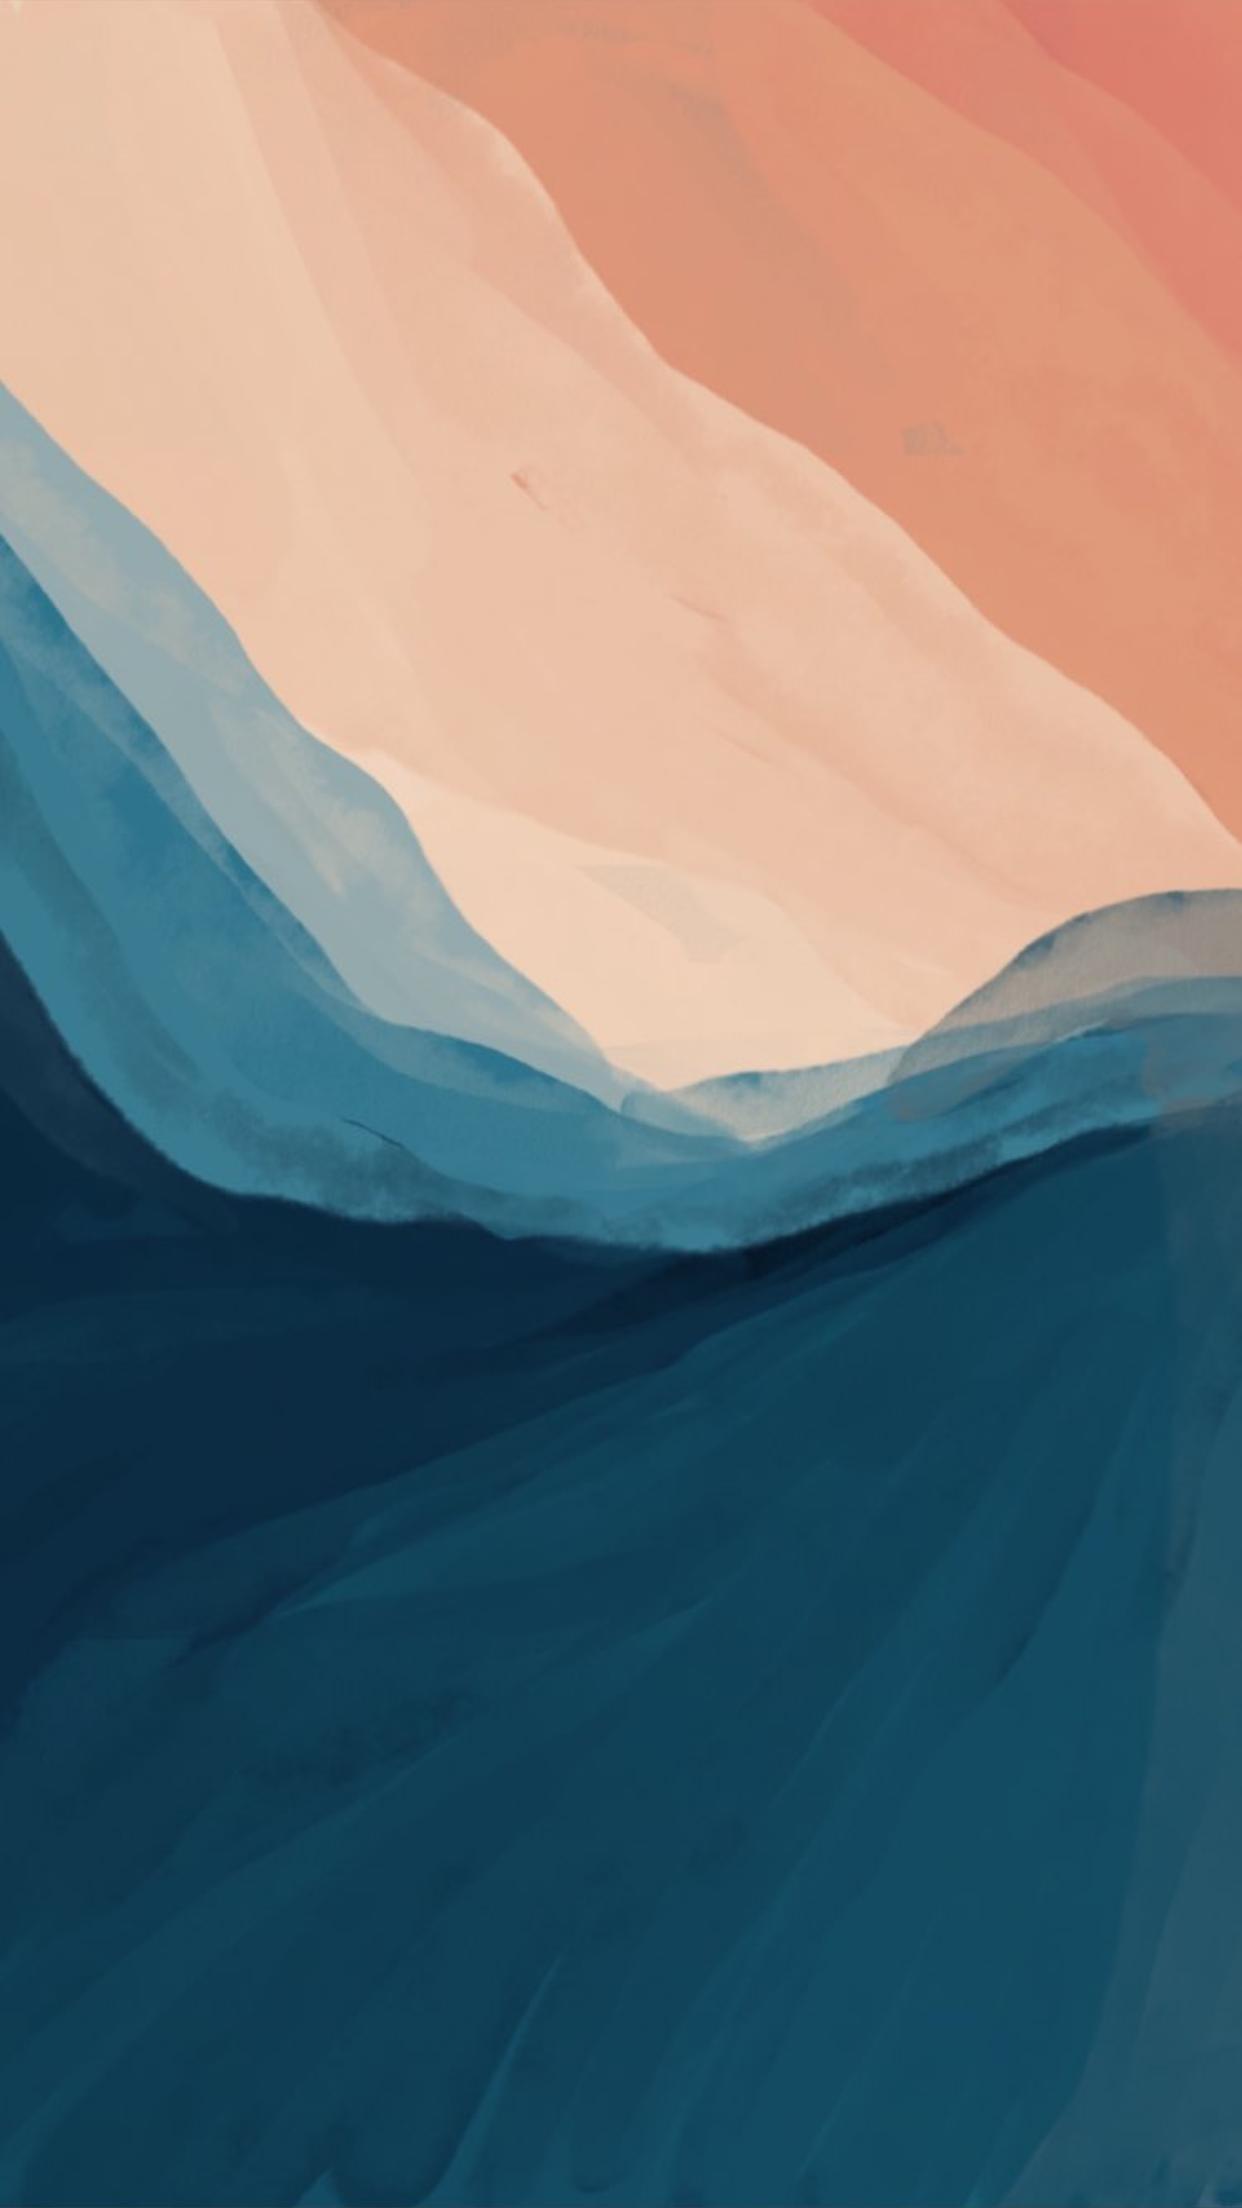 Plain Aesthetic White Background